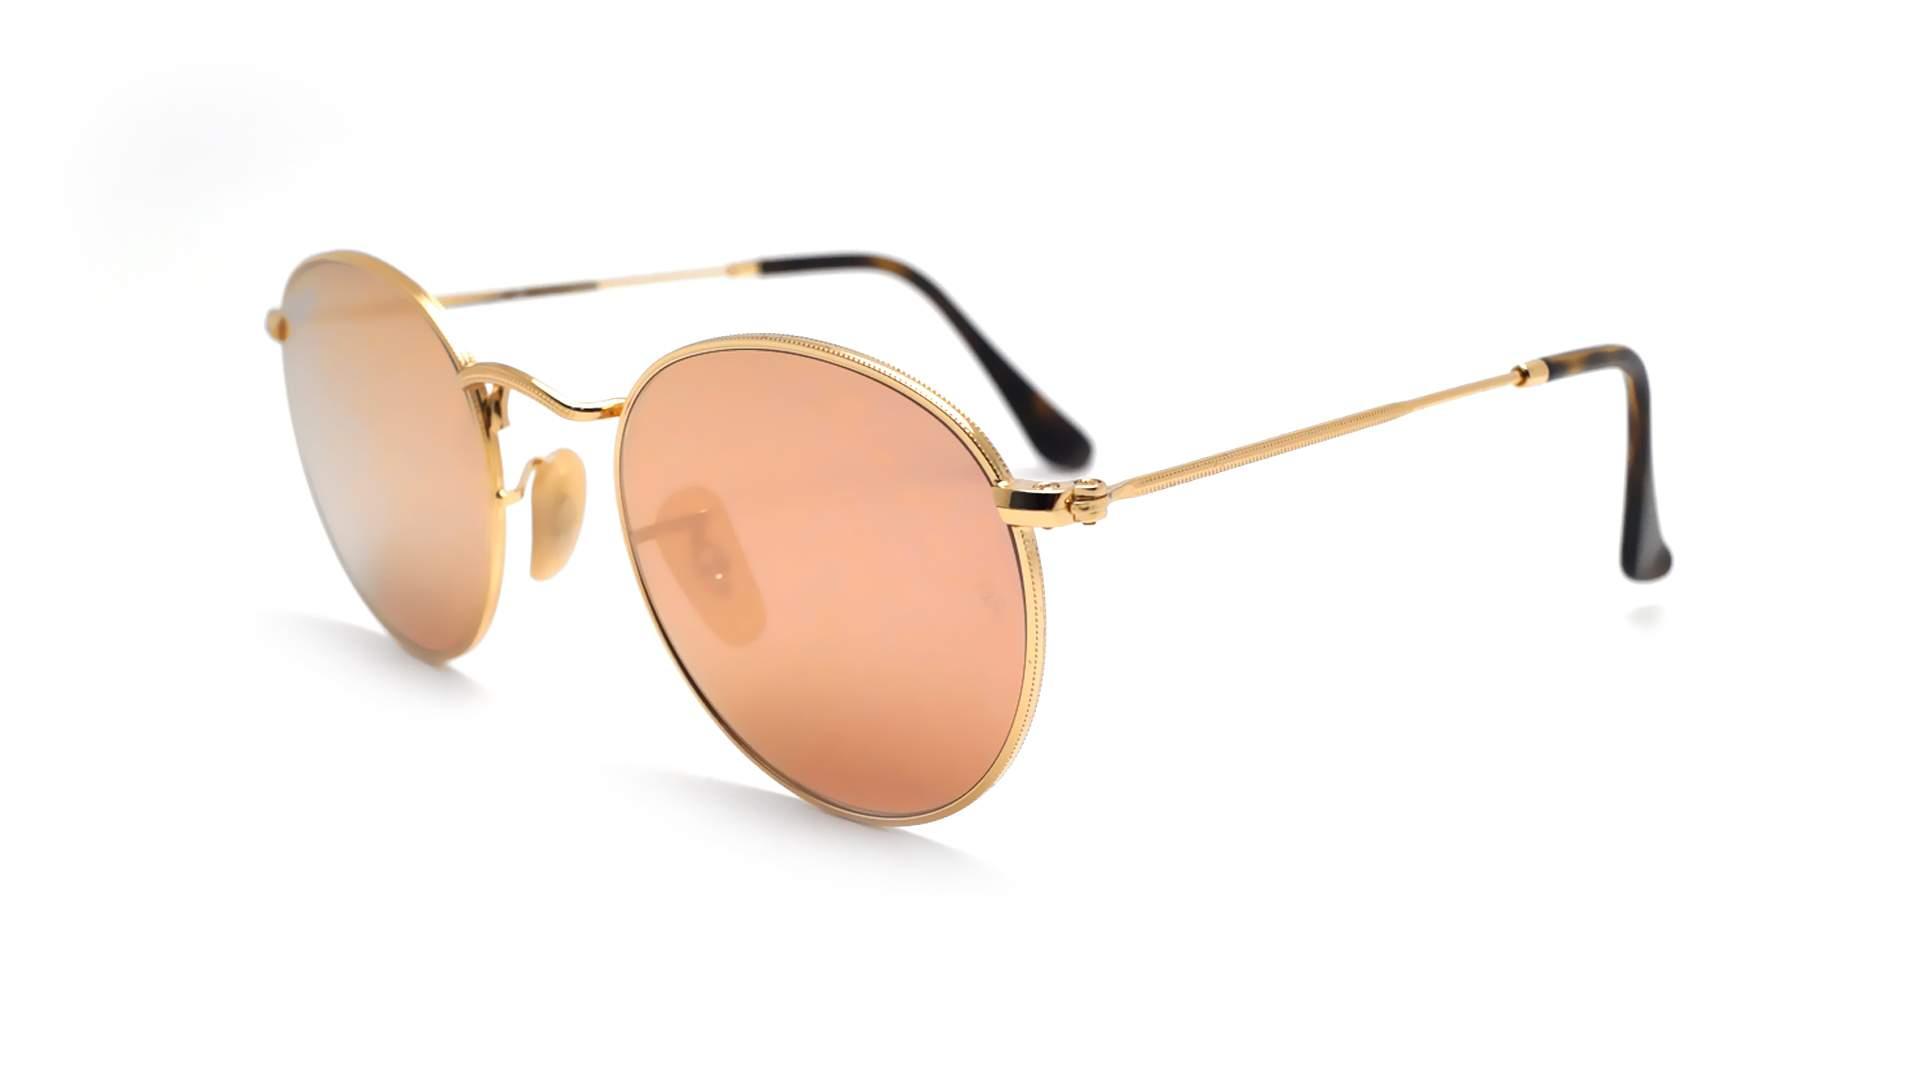 6e0979eb46 Sunglasses Ray-Ban Round Metal Flat Lenses RB3447N 001 Z2 47-21 Gold Small  Mirror